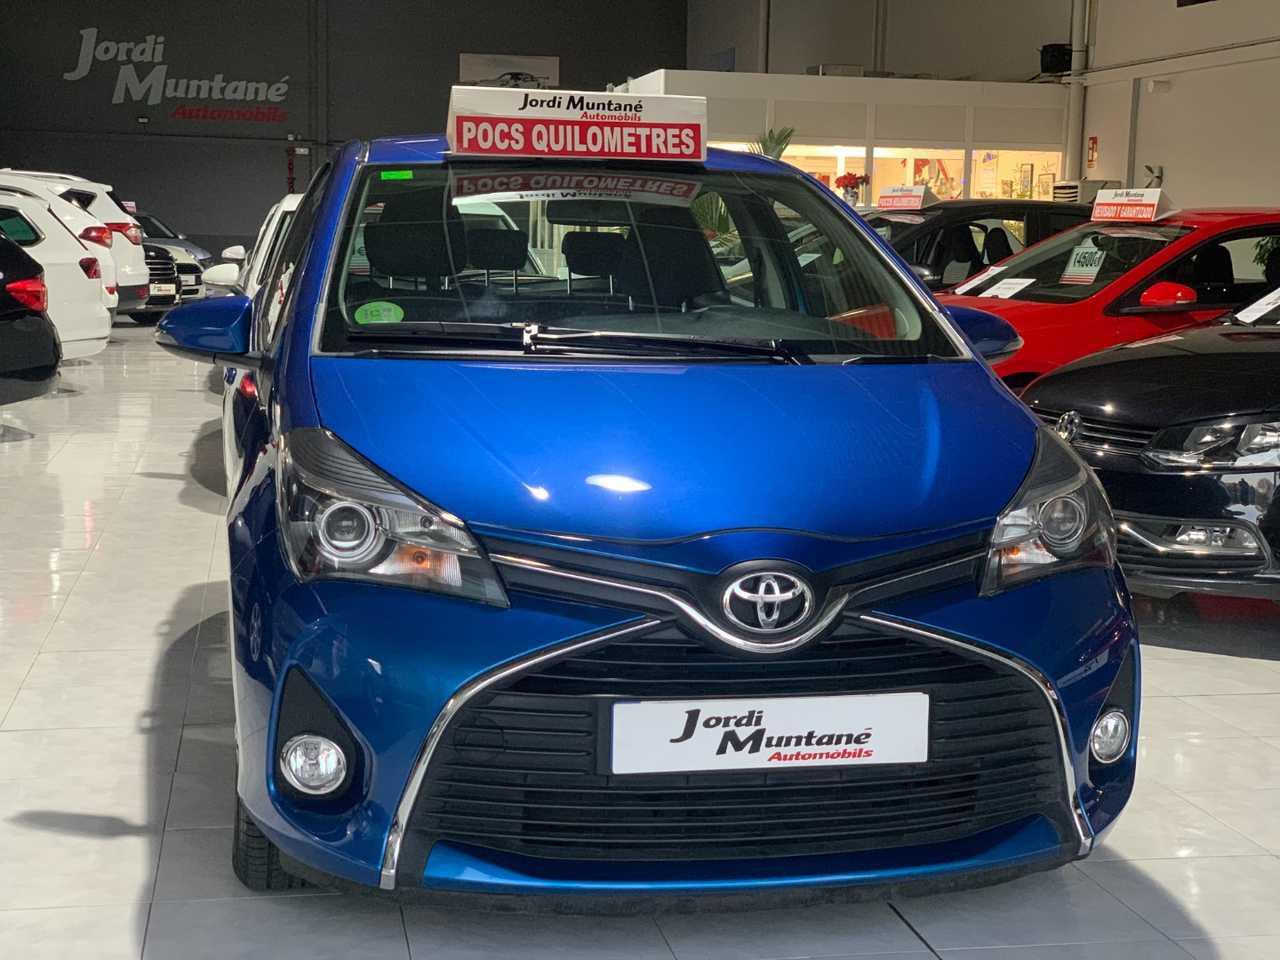 Toyota Yaris 1.3 VVTI 100cv -. '' SOLO 81.665 KM '' .- Active 5 Puertas -.